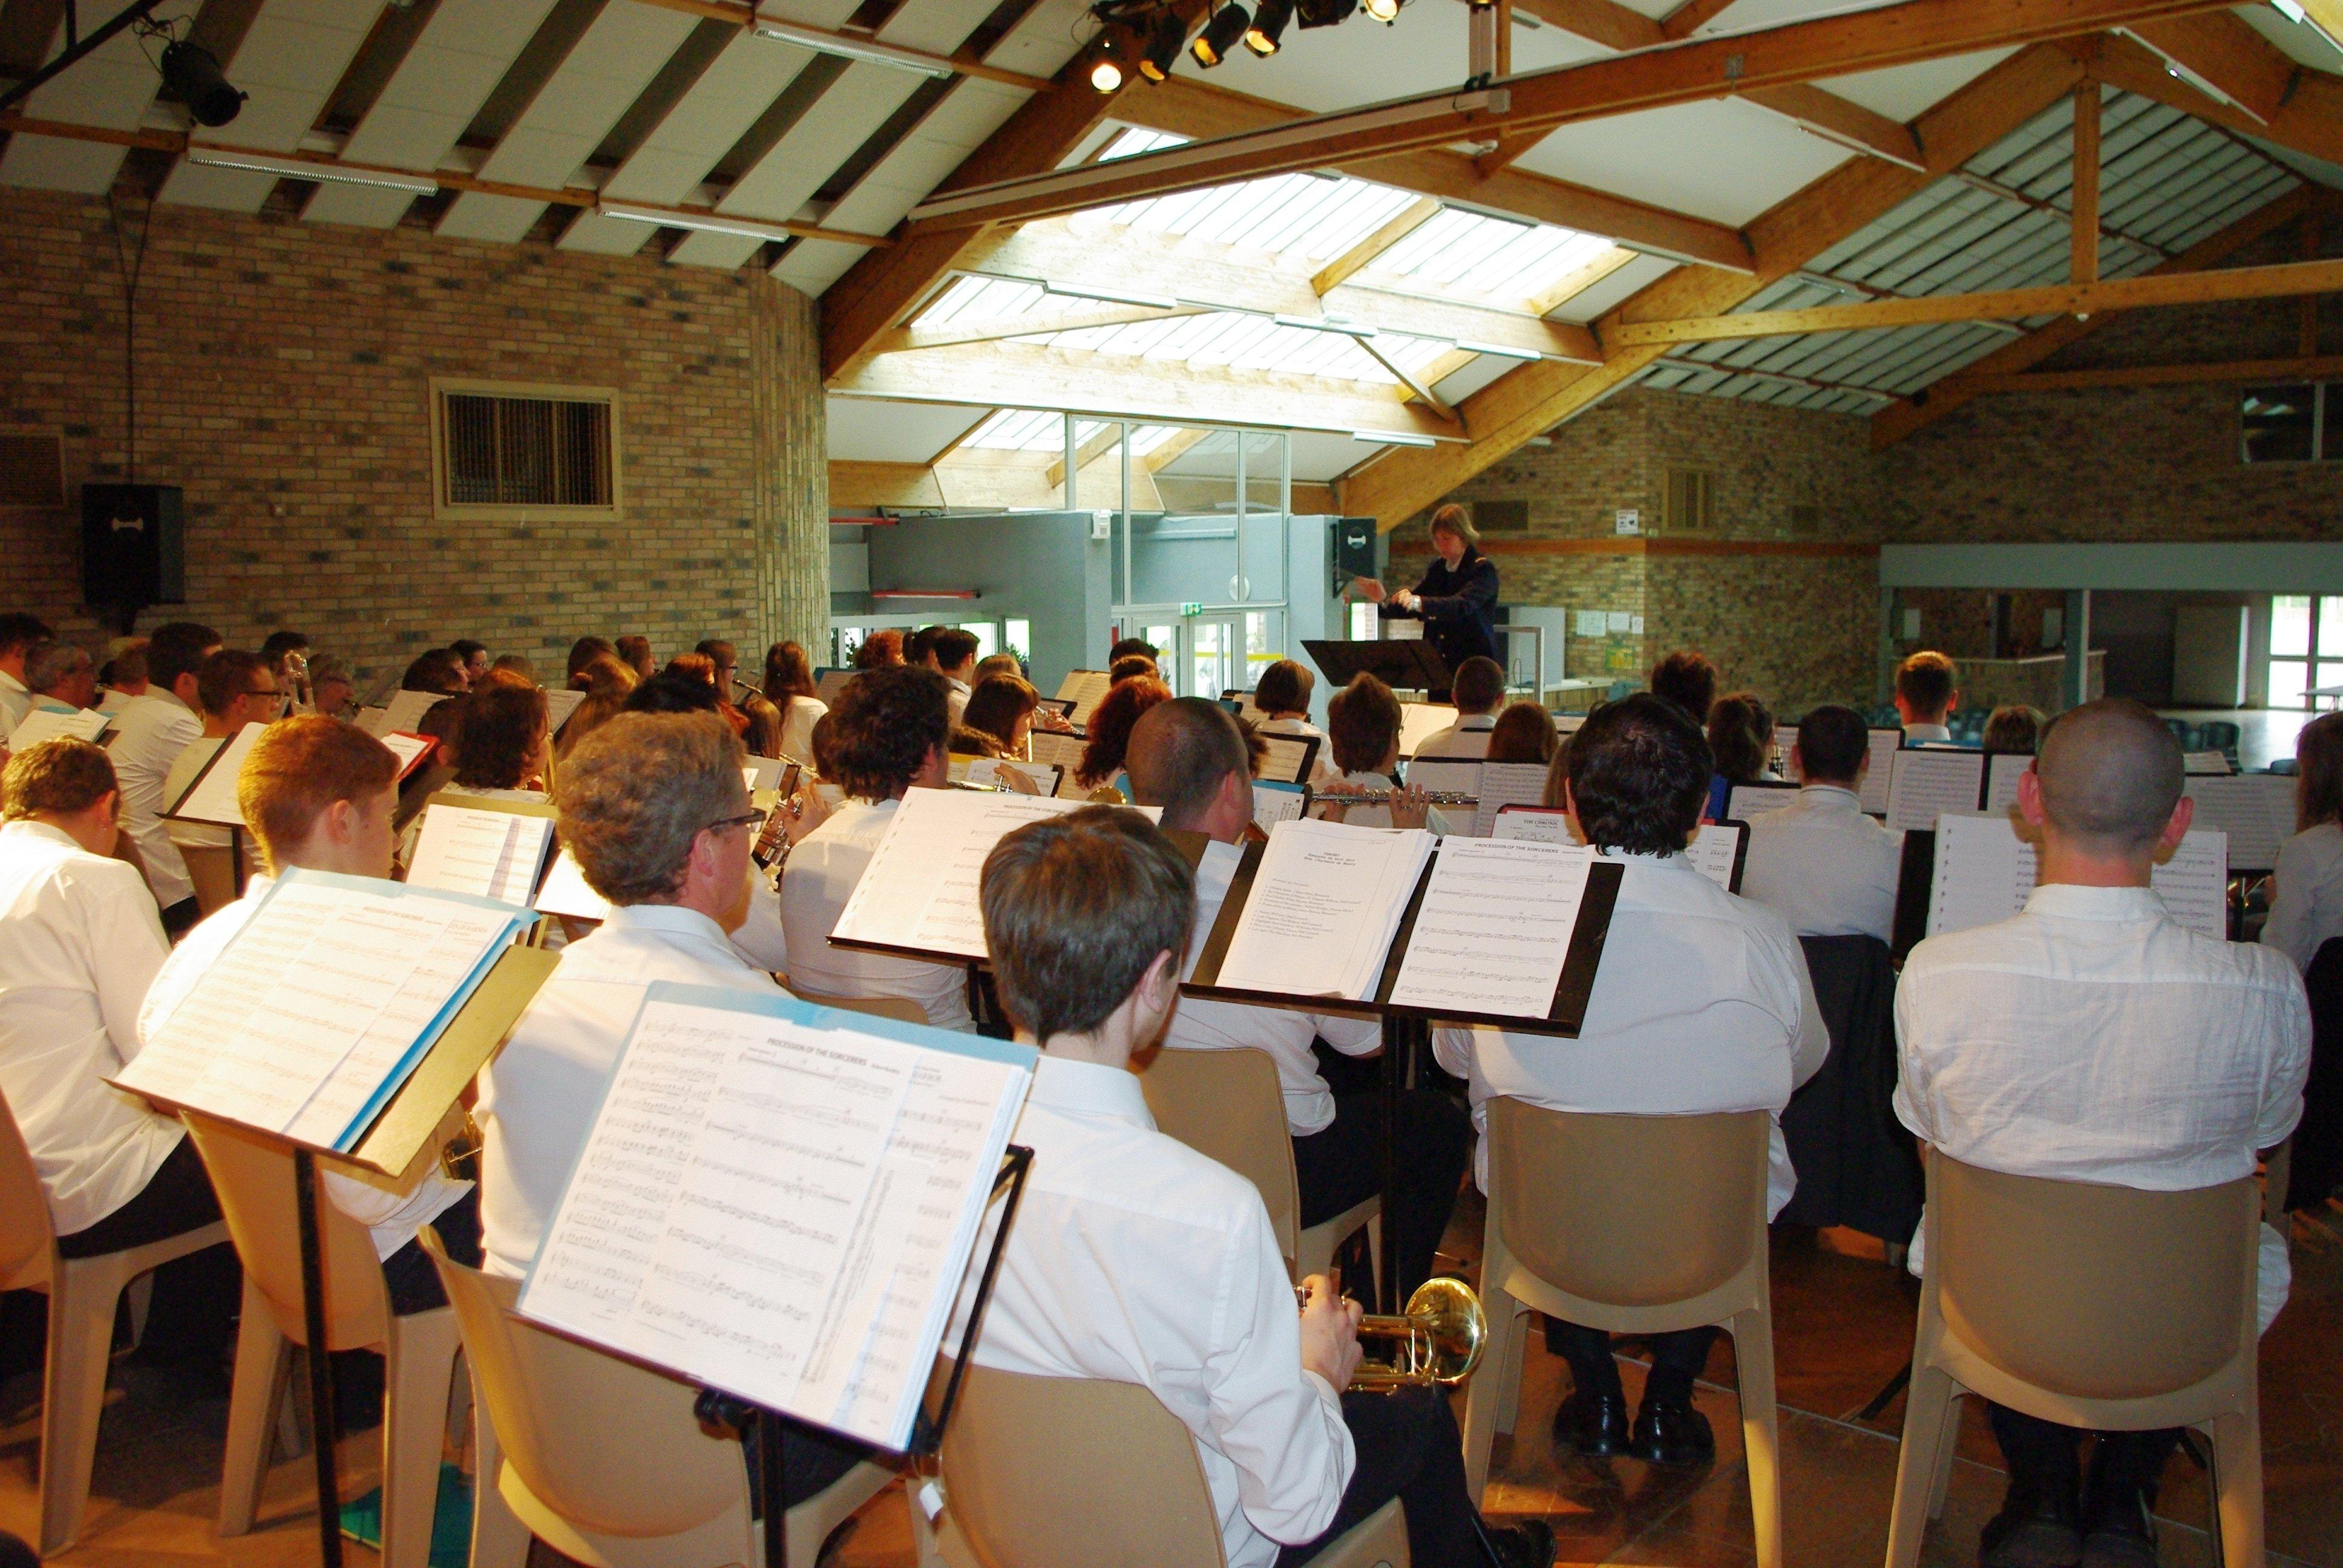 5e-musicofolies-6-avril-2014-6 2014 dans Harmonie de Beuvry